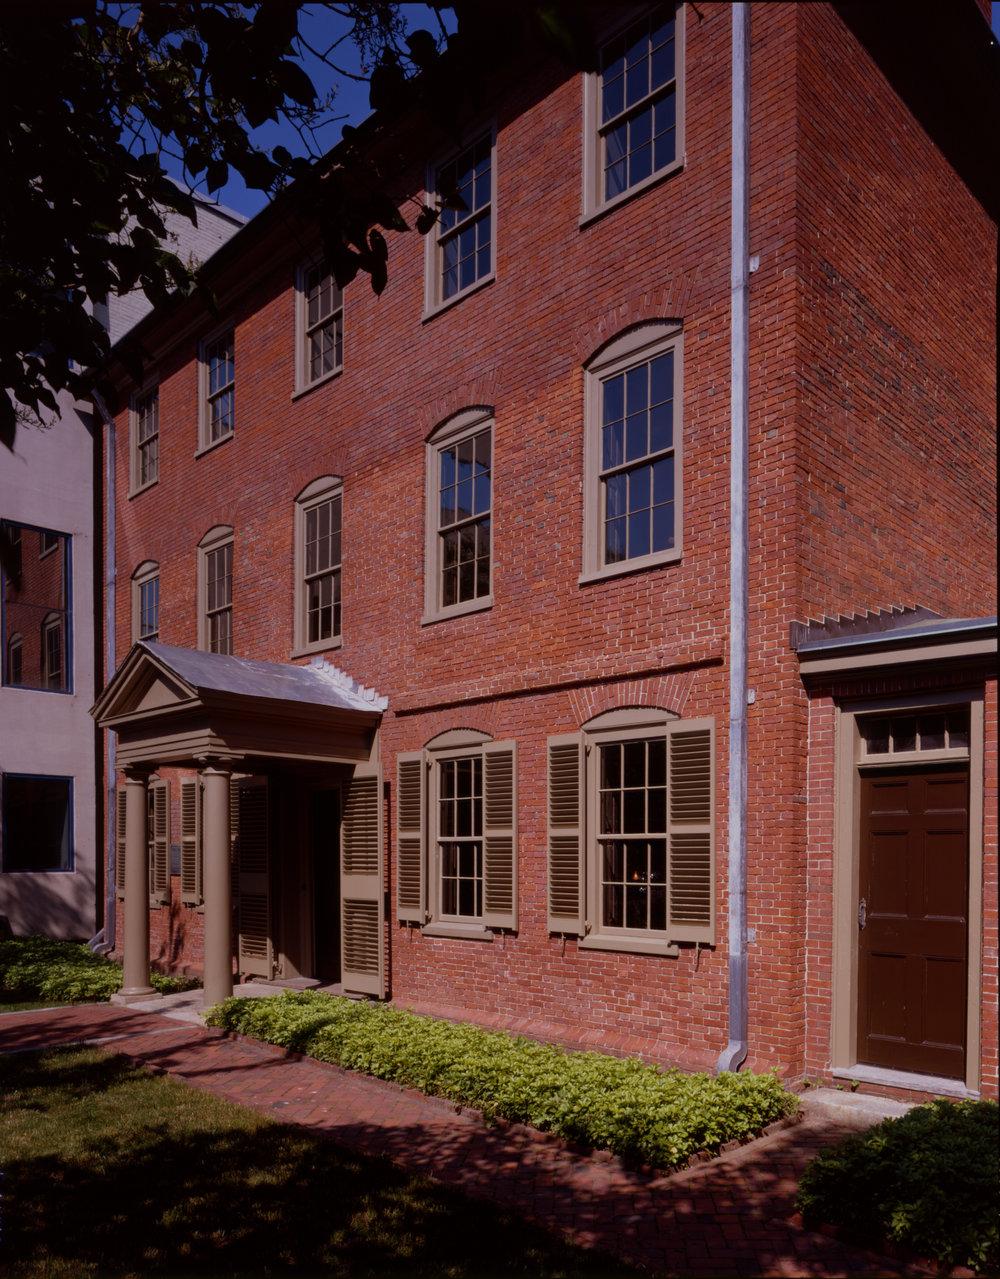 Wadsworth-Longfellow House … Courtesy of the Maine Historical Society